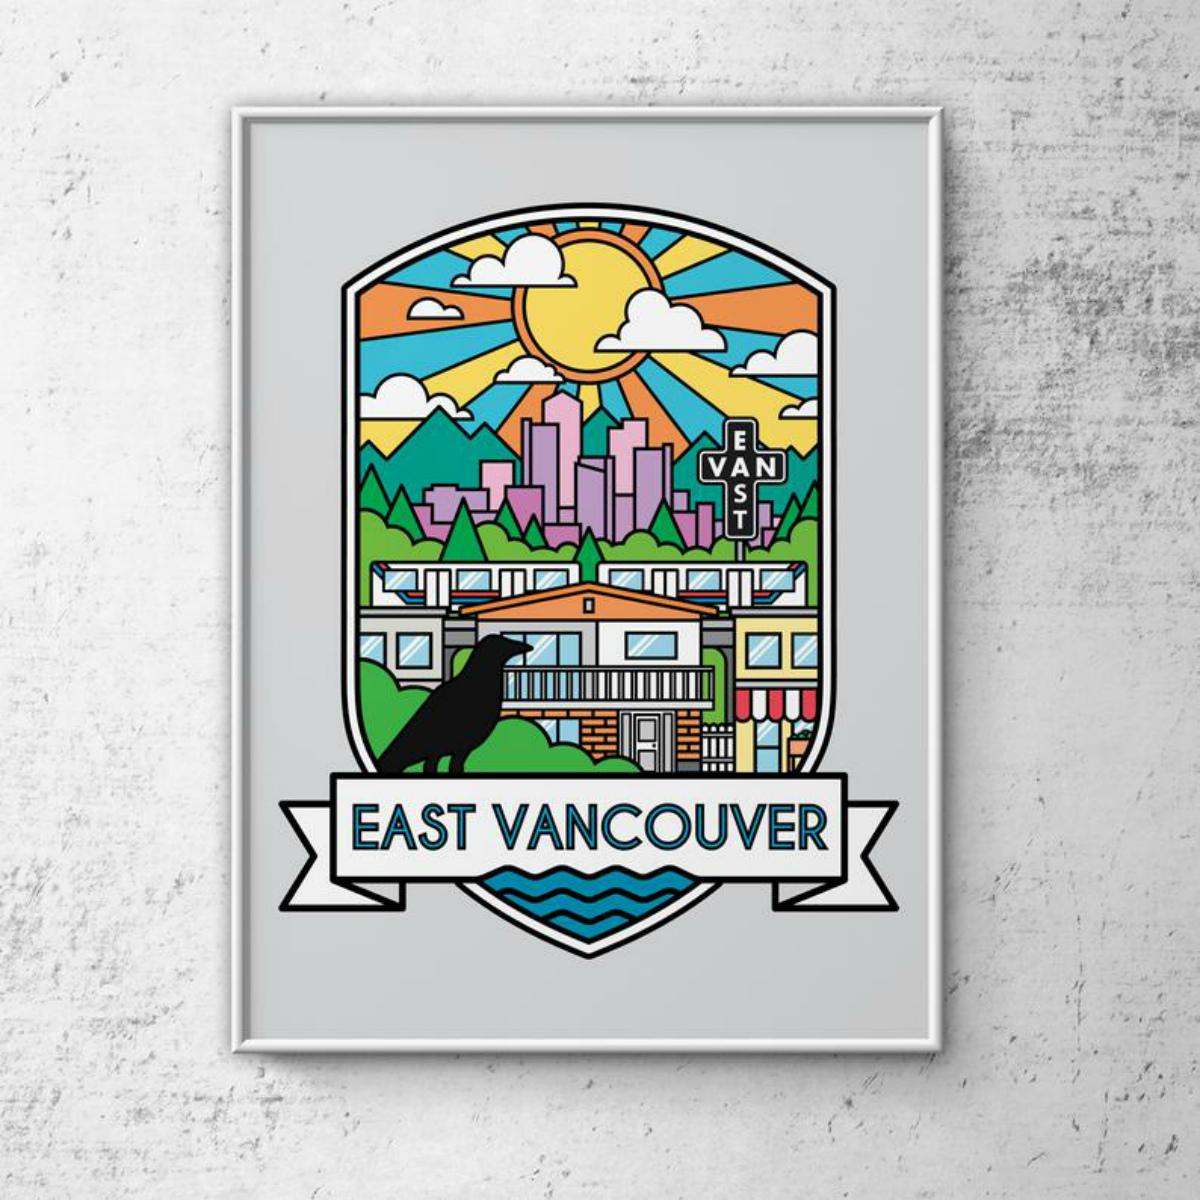 East Vancouver Art